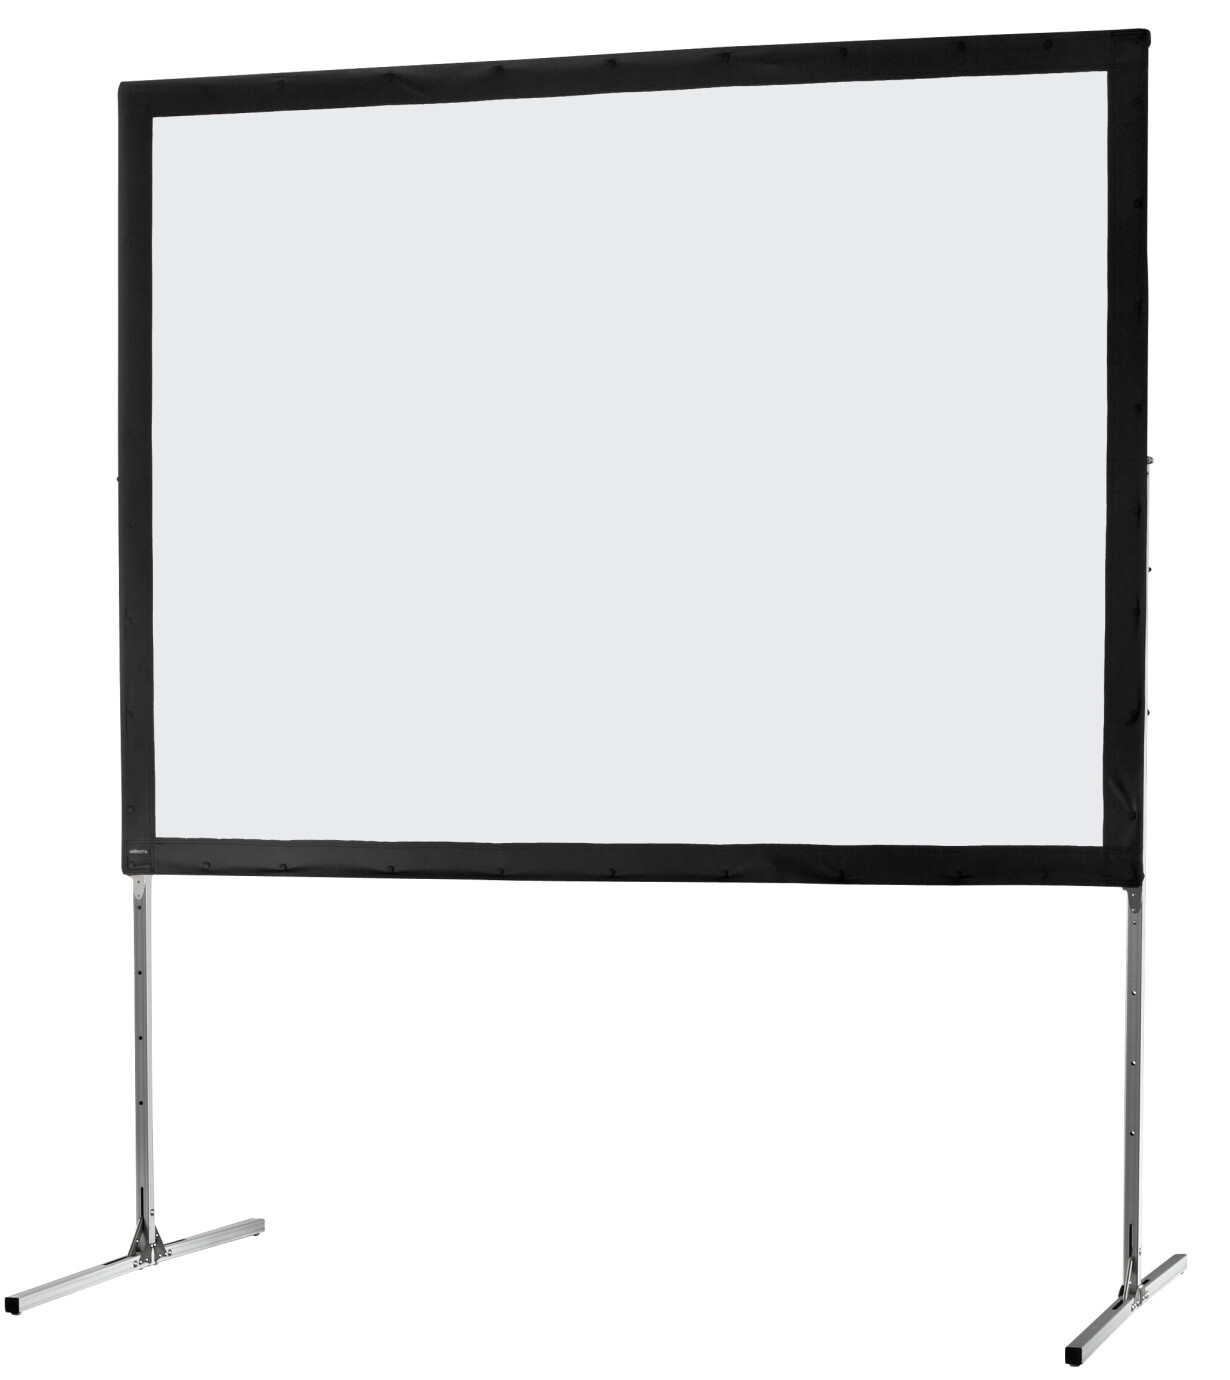 celexon Folding Frame screen 203 x 152cm Mobile Expert, front projection